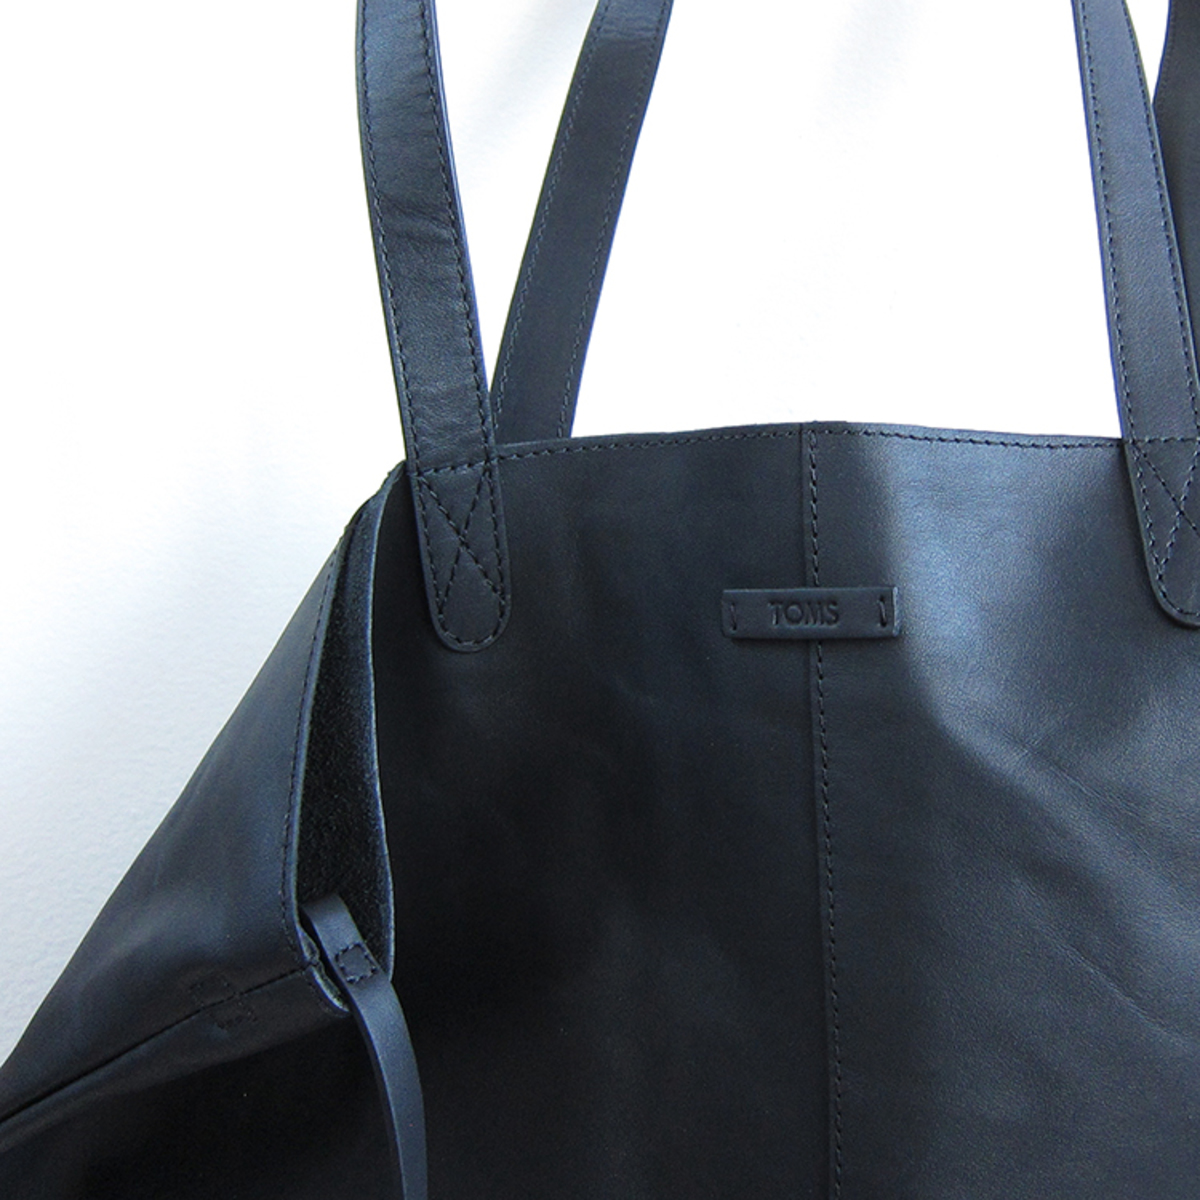 c8c7f3ff1ee Toms leather Cosmopolitan tote - black | Garmentory